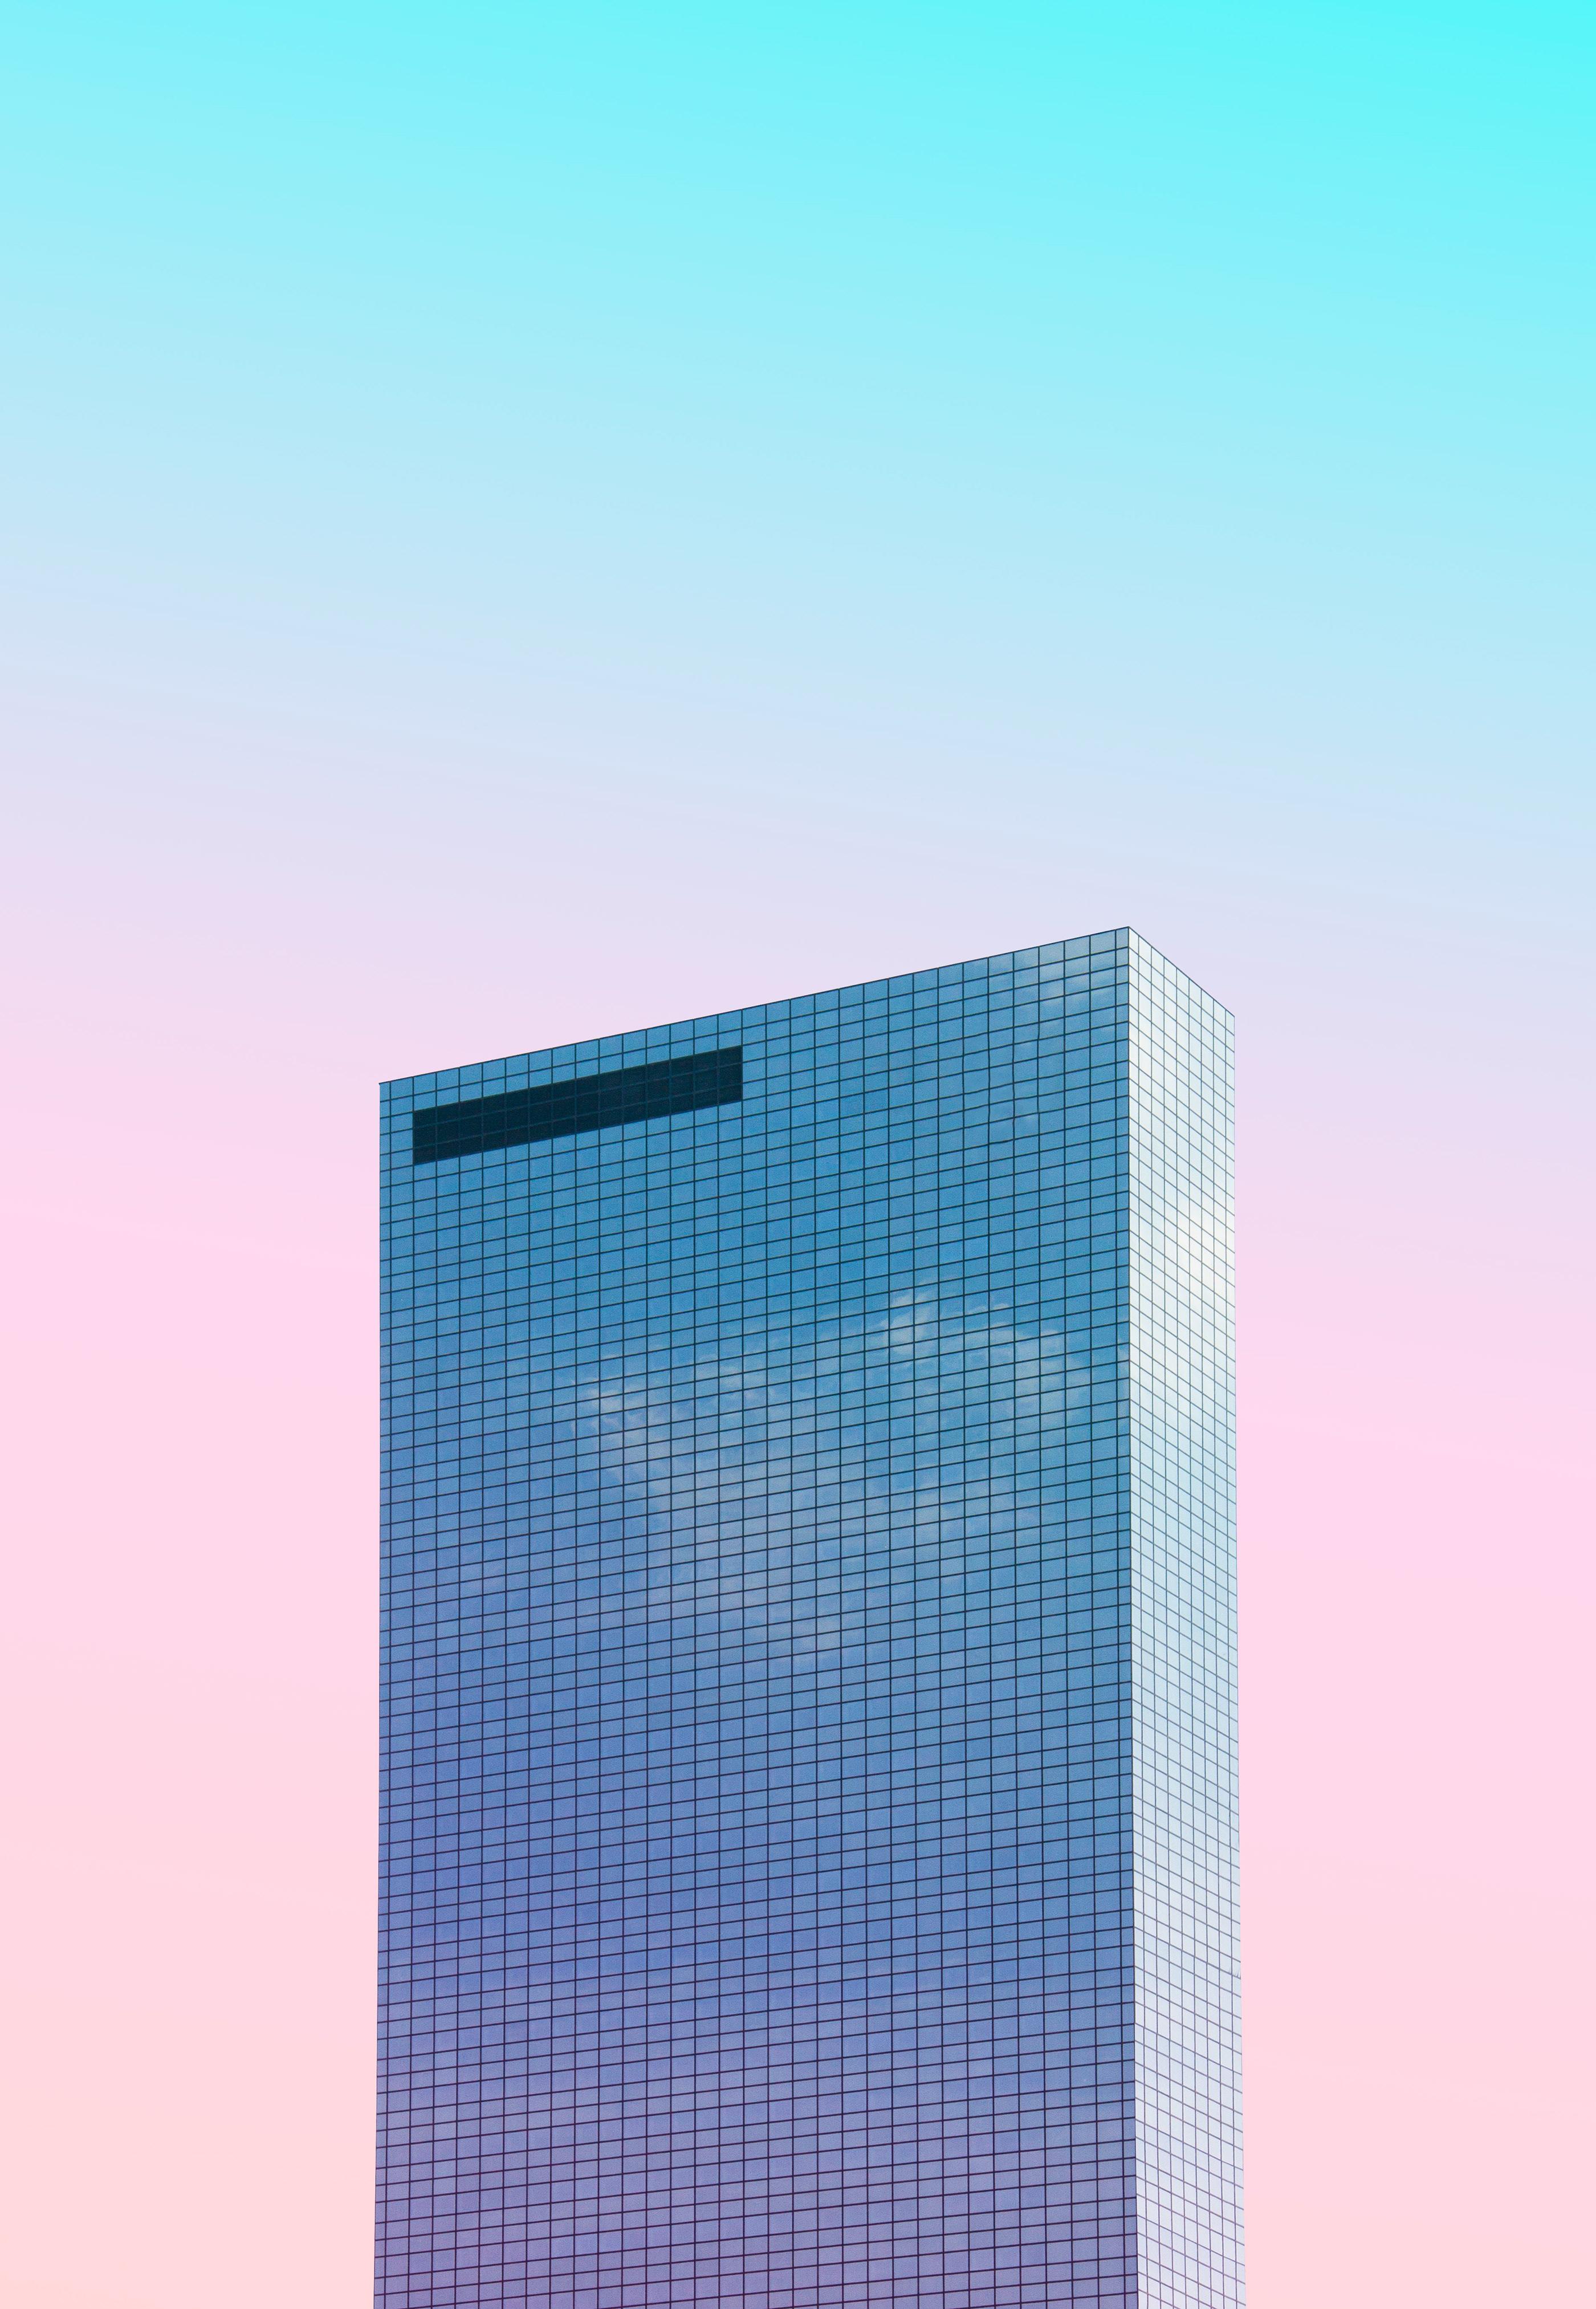 Digital Photography Series: Candy Rotterdam